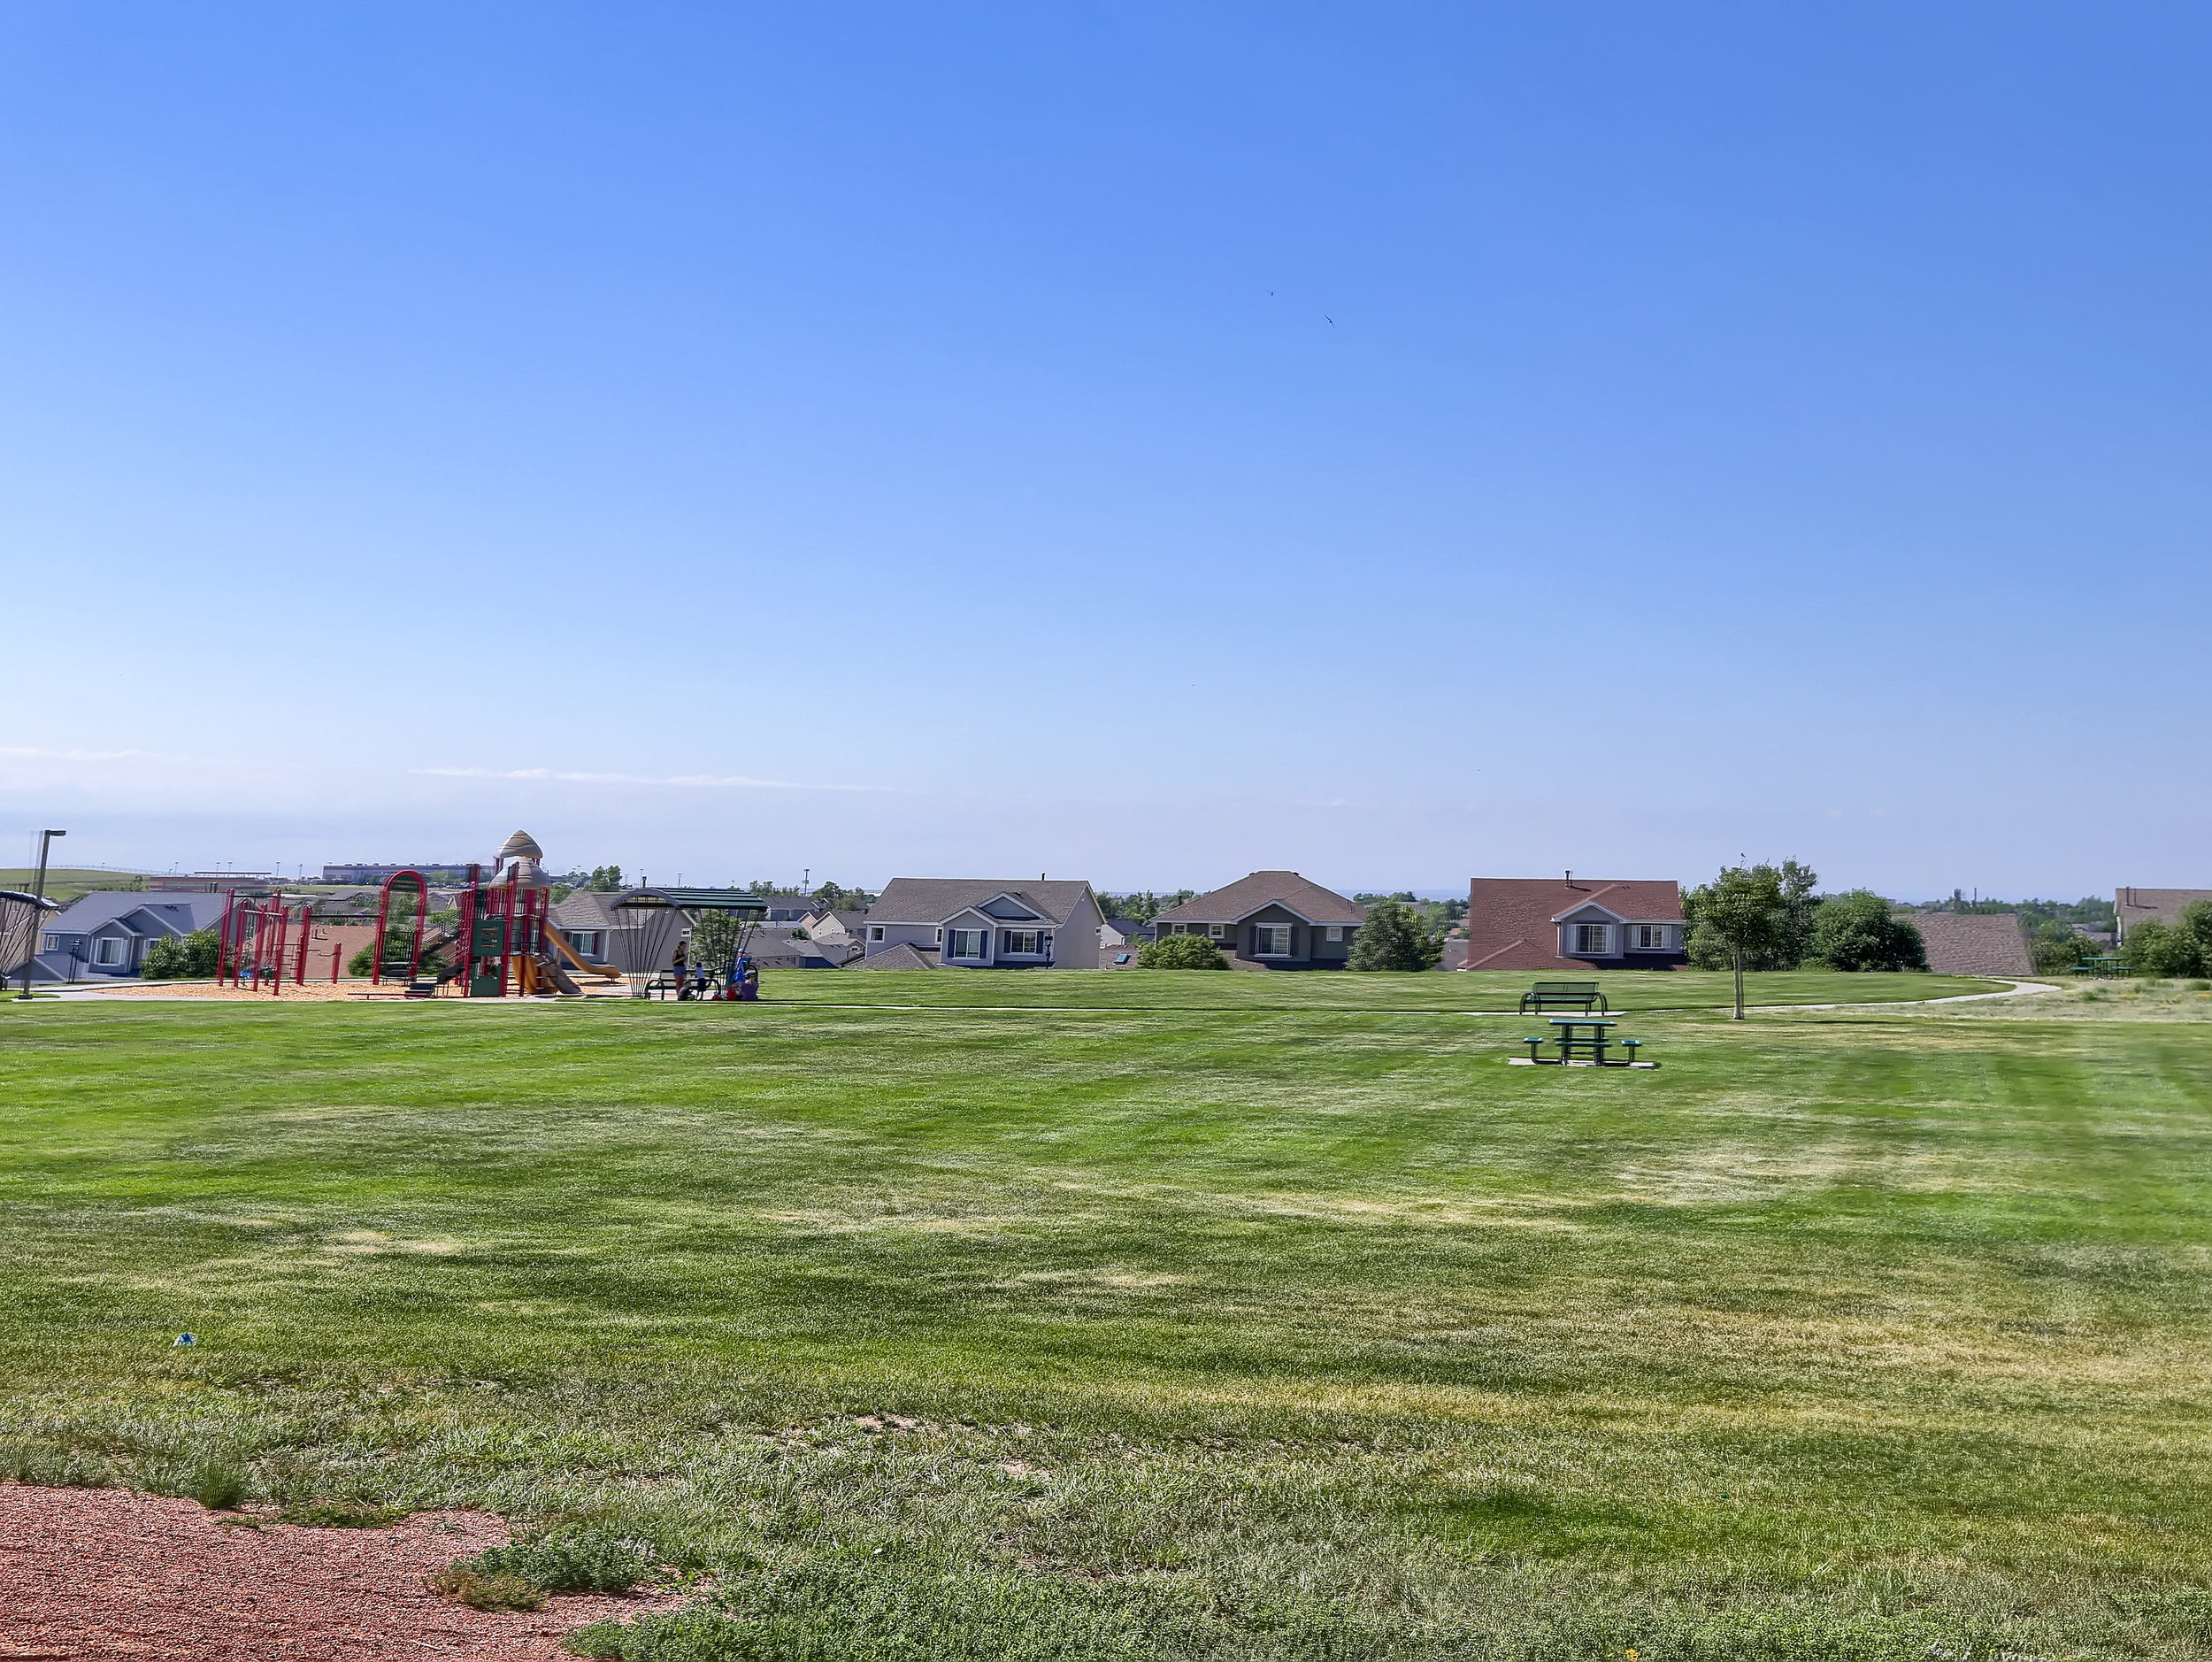 7414 Campstool Drive Colorado-print-045-043-Neighborhood-3233x2429-300dpi.jpg